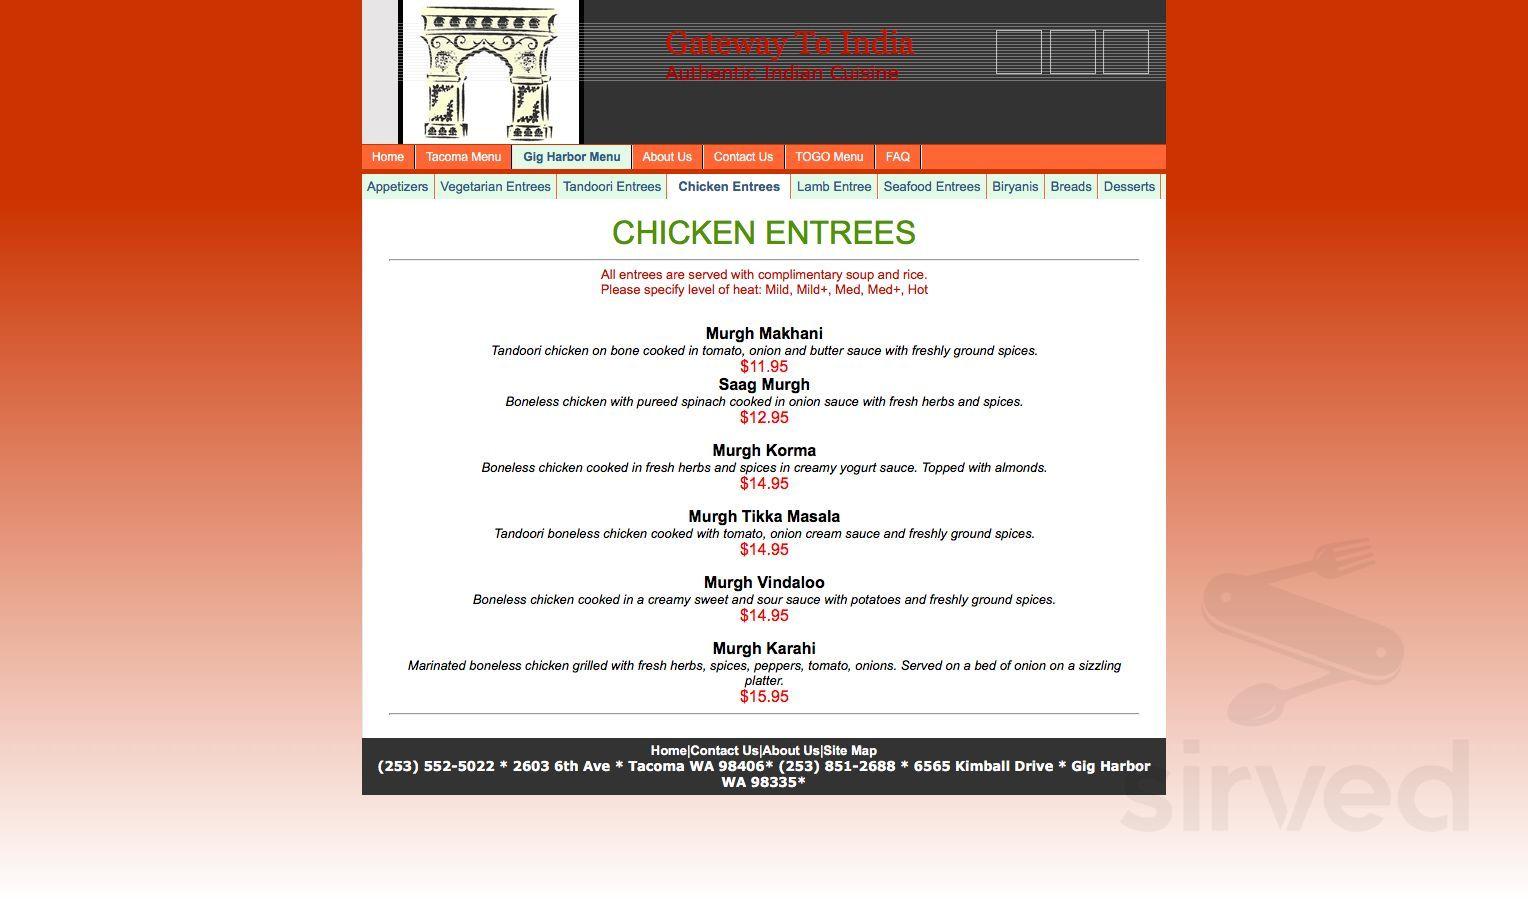 Menu For Gateway To India Restaurant In Gig Harbor Washington